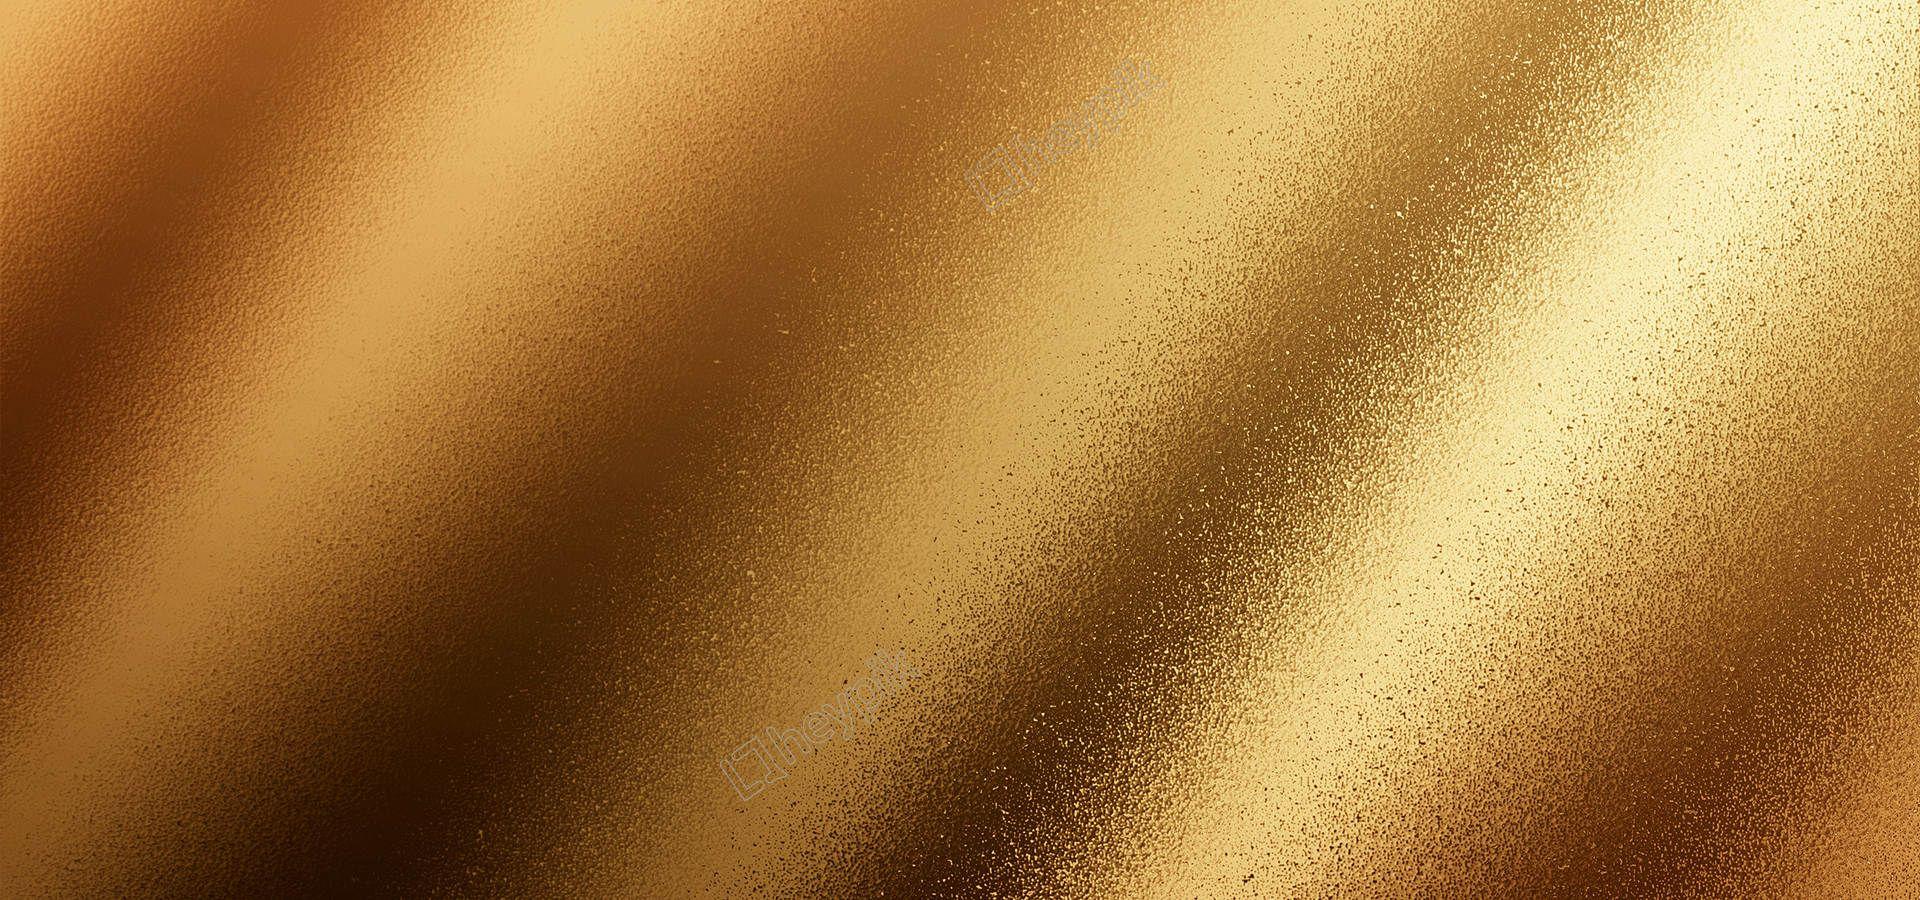 24++ Gold textures information